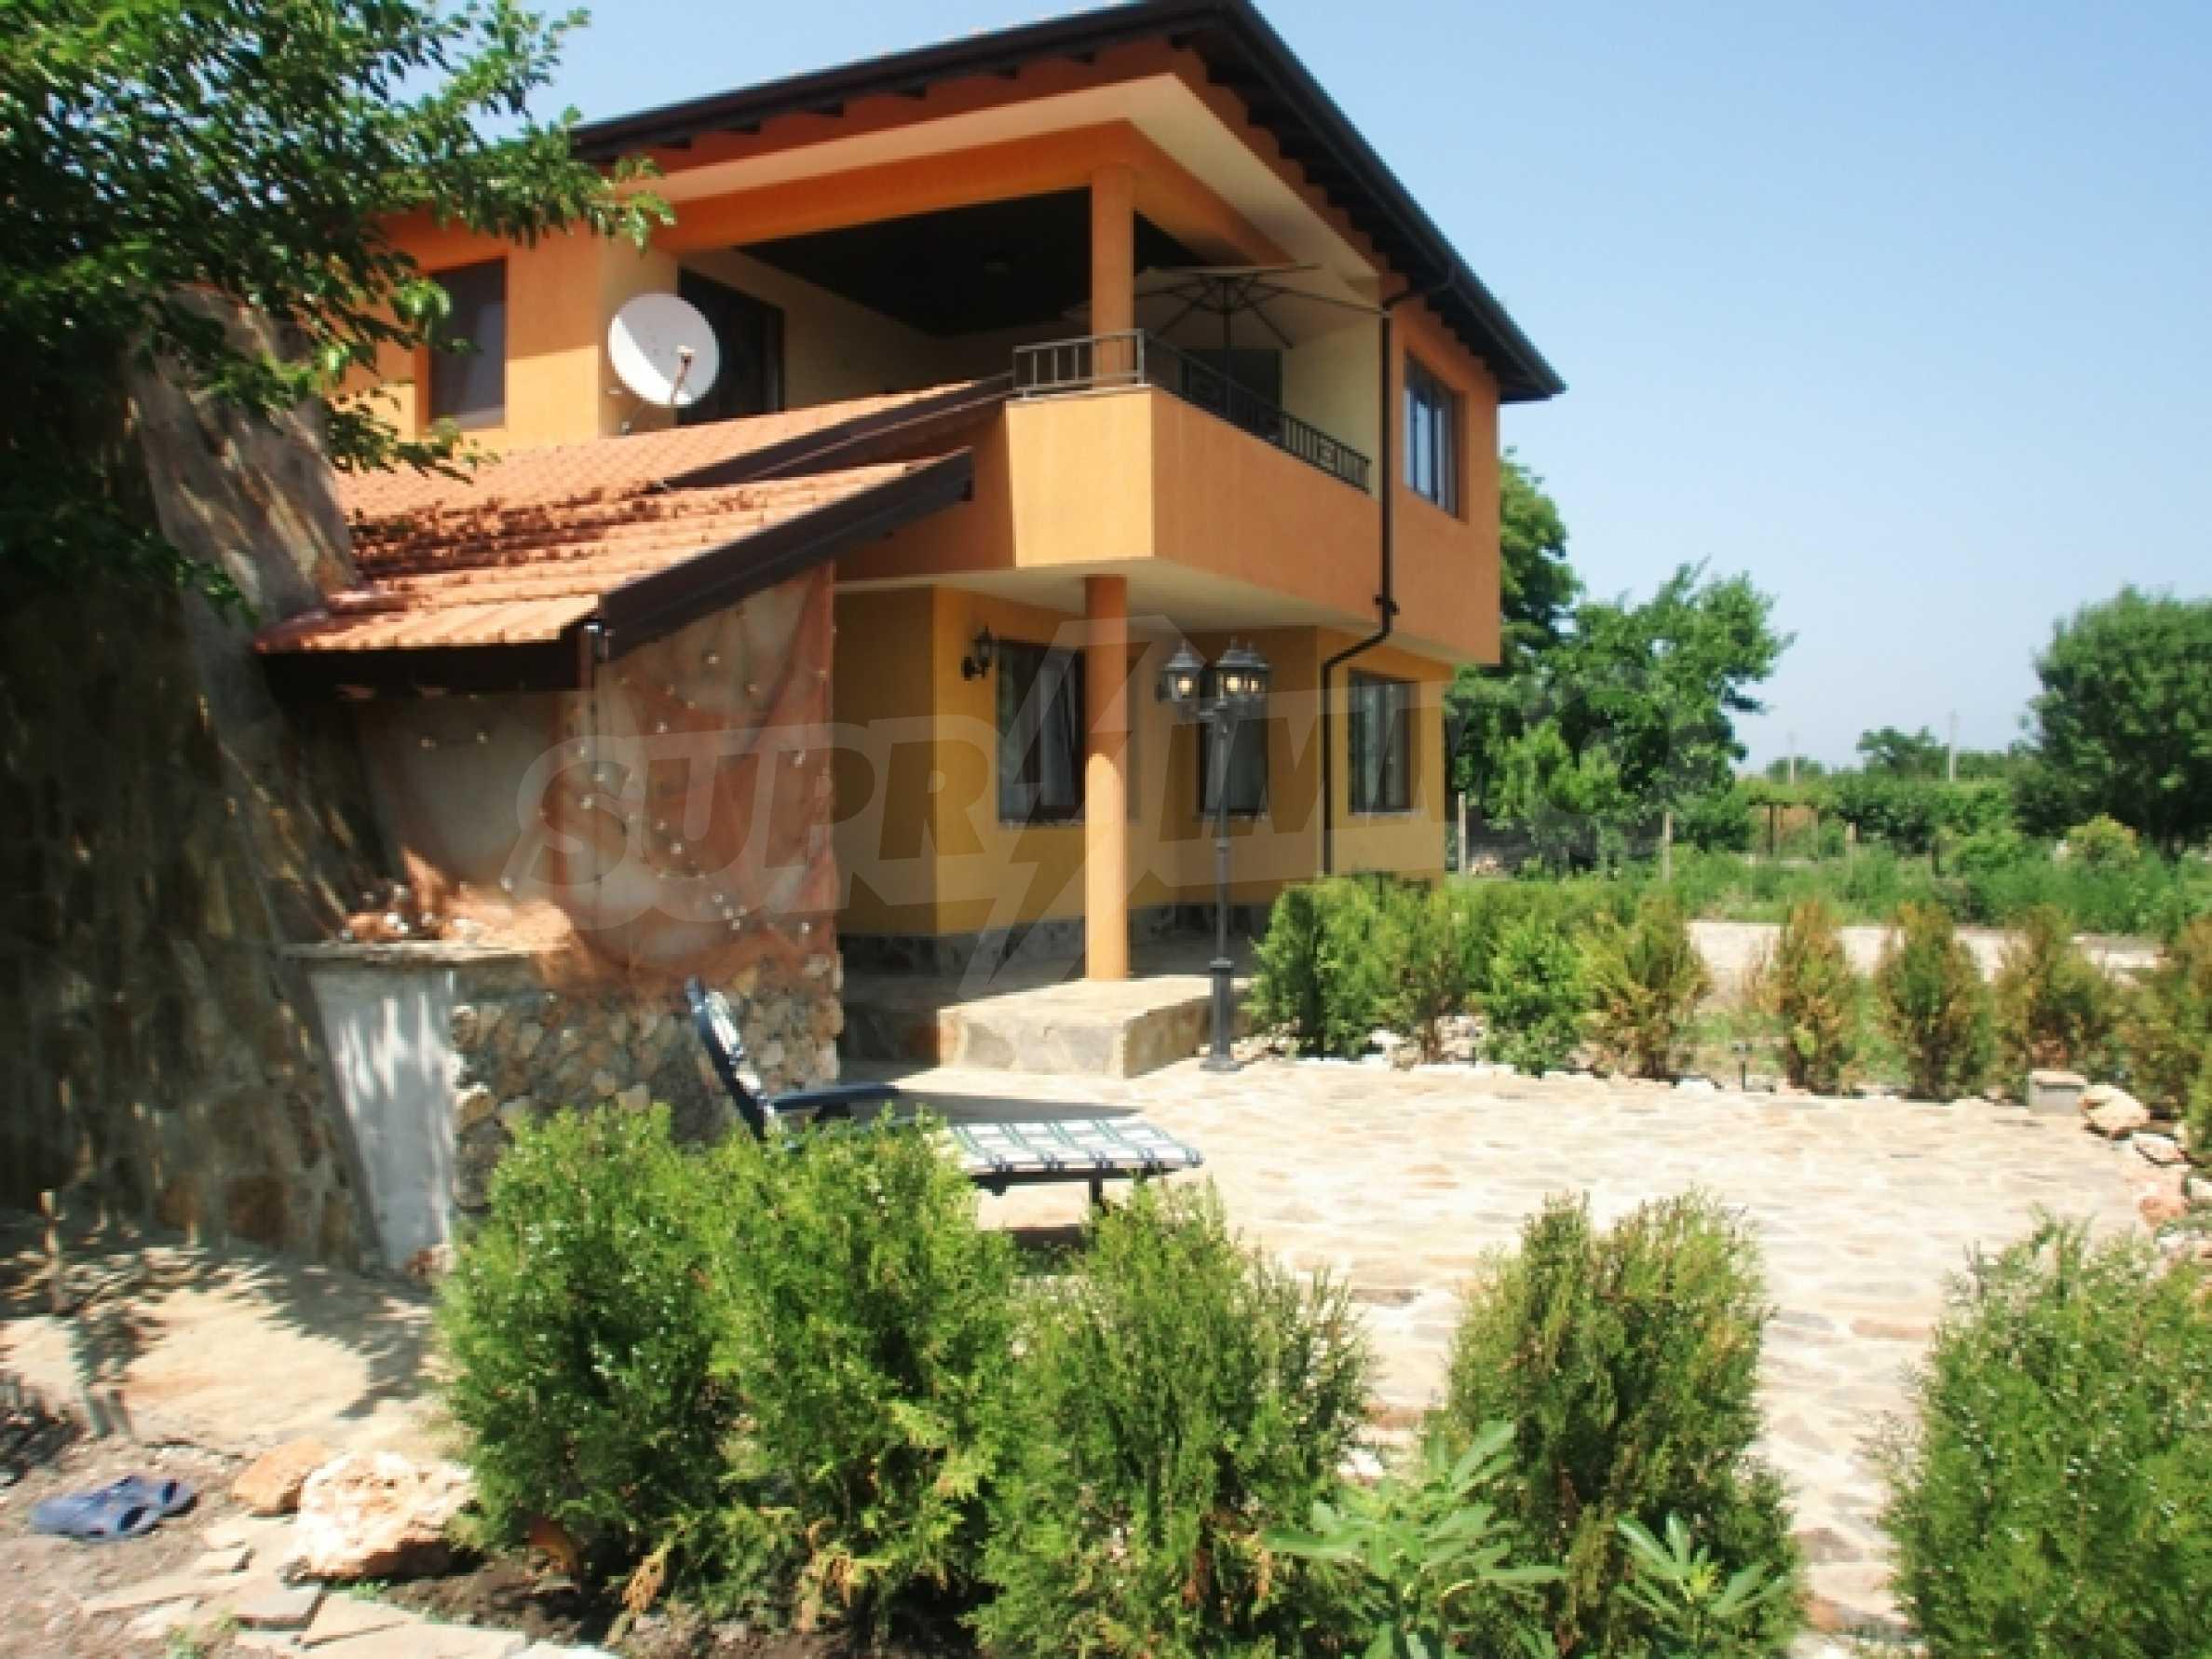 Haus im Dorf Tyulenovo 9